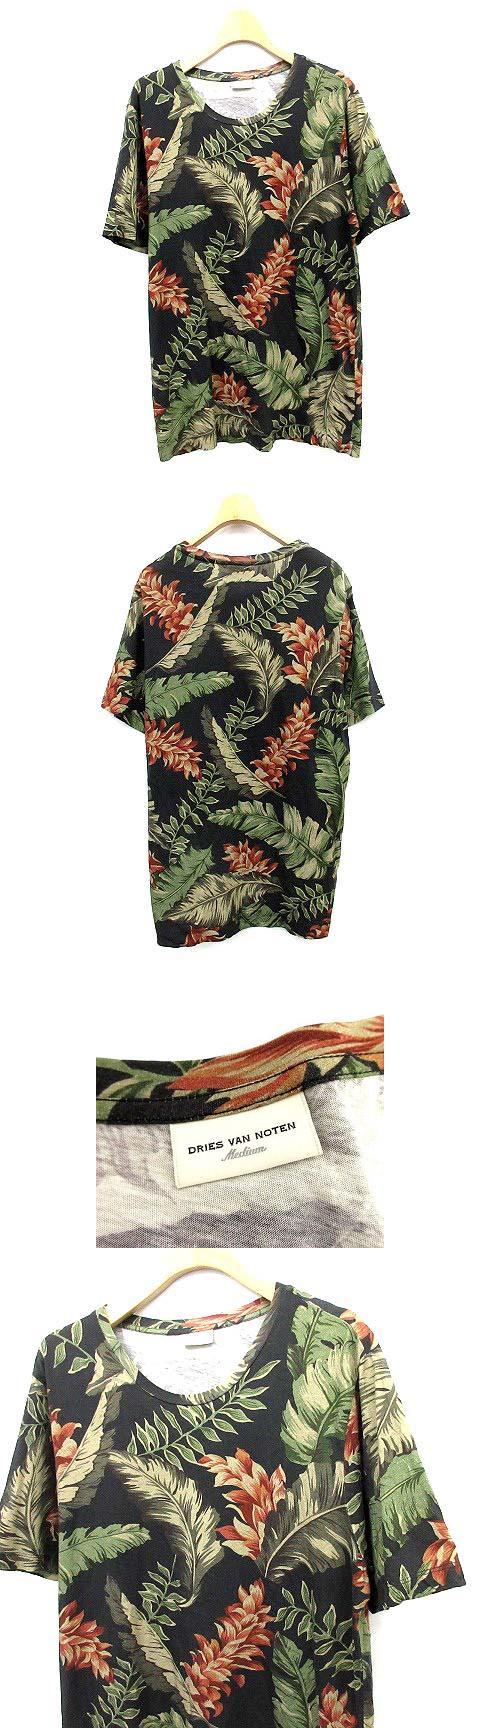 Tシャツ 半袖 カットソー ボタニカル M 黒  /☆G